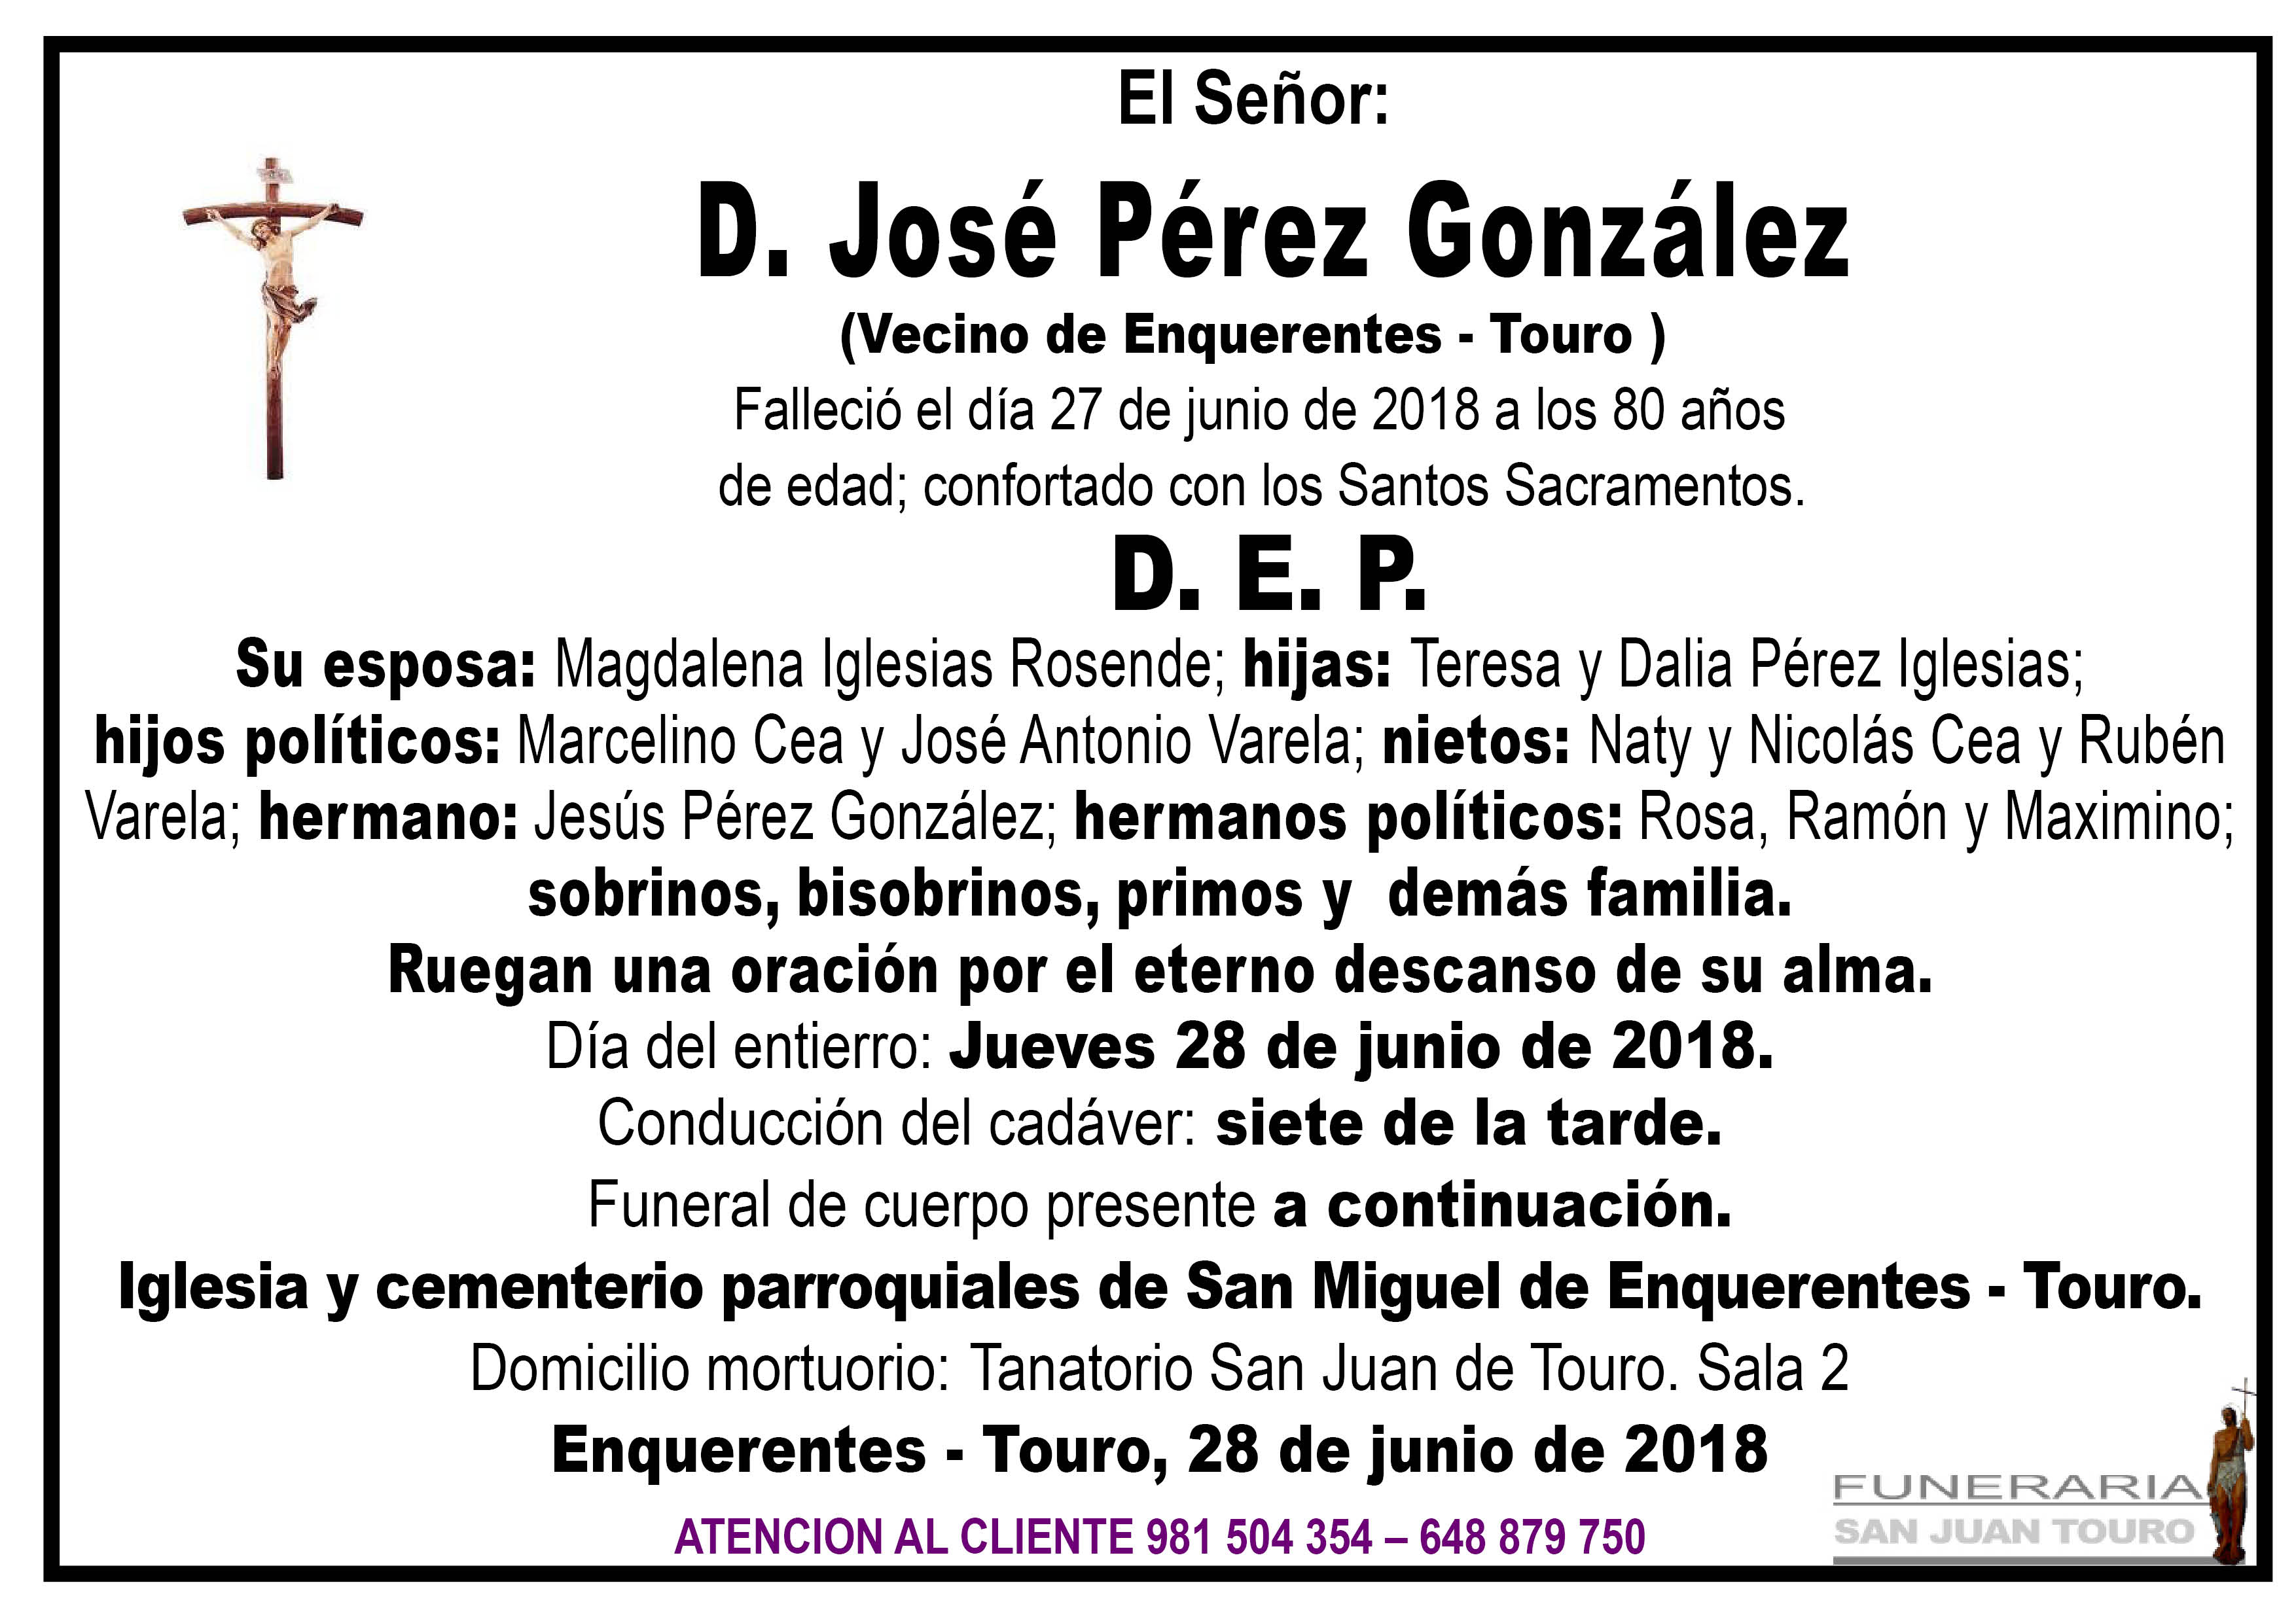 Esquela de SEPELIO DE DON JOSE PEREZ GONZALEZ